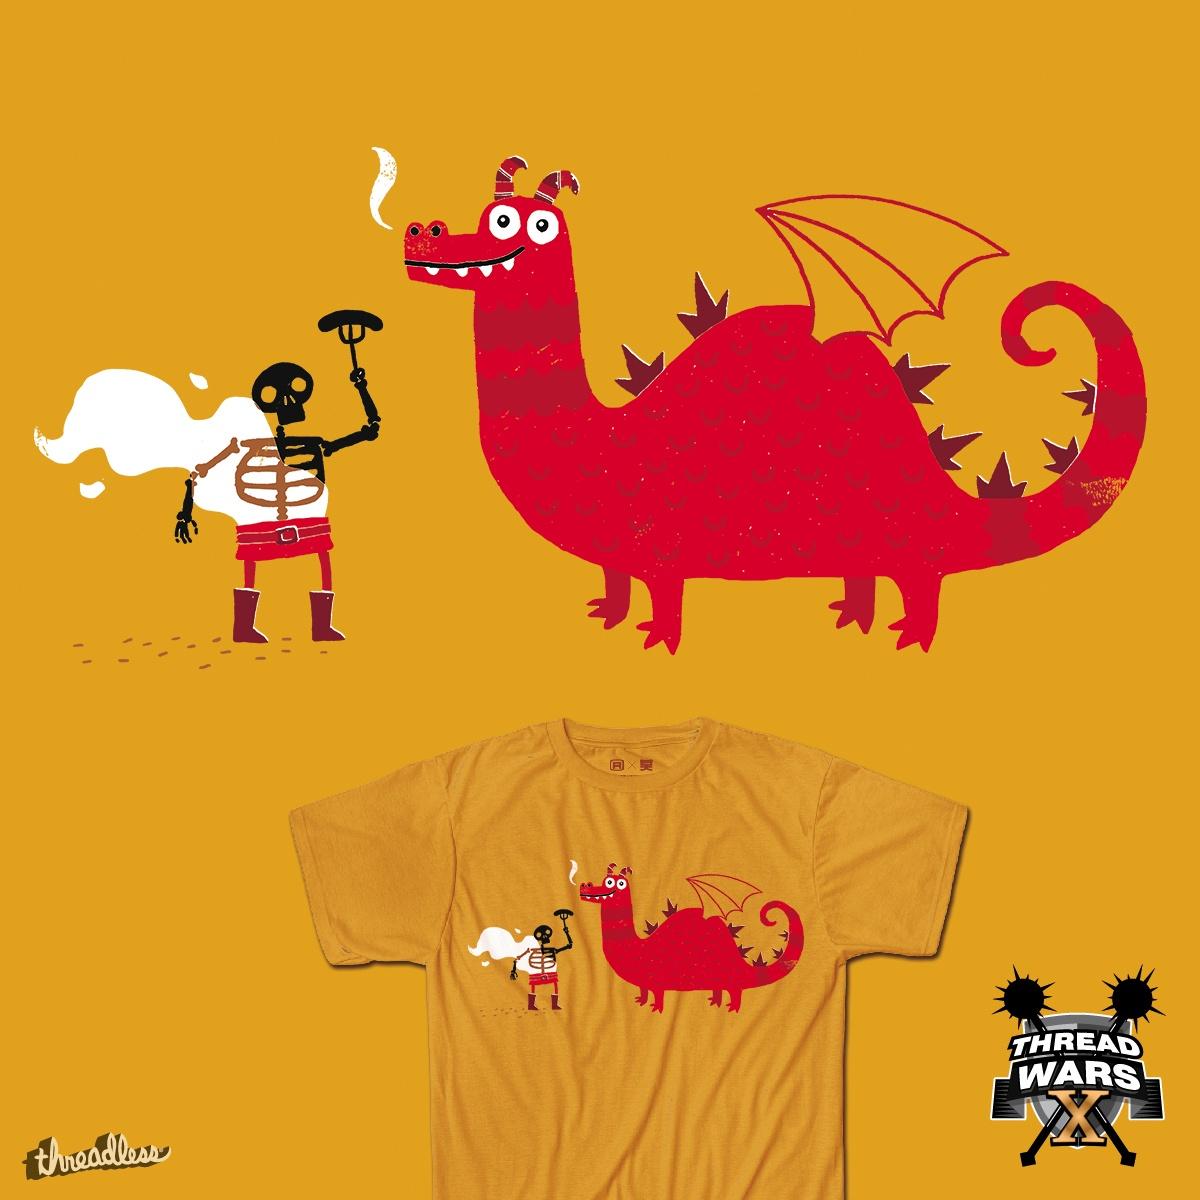 Score Dragon BBQ by DinoMike on Threadless